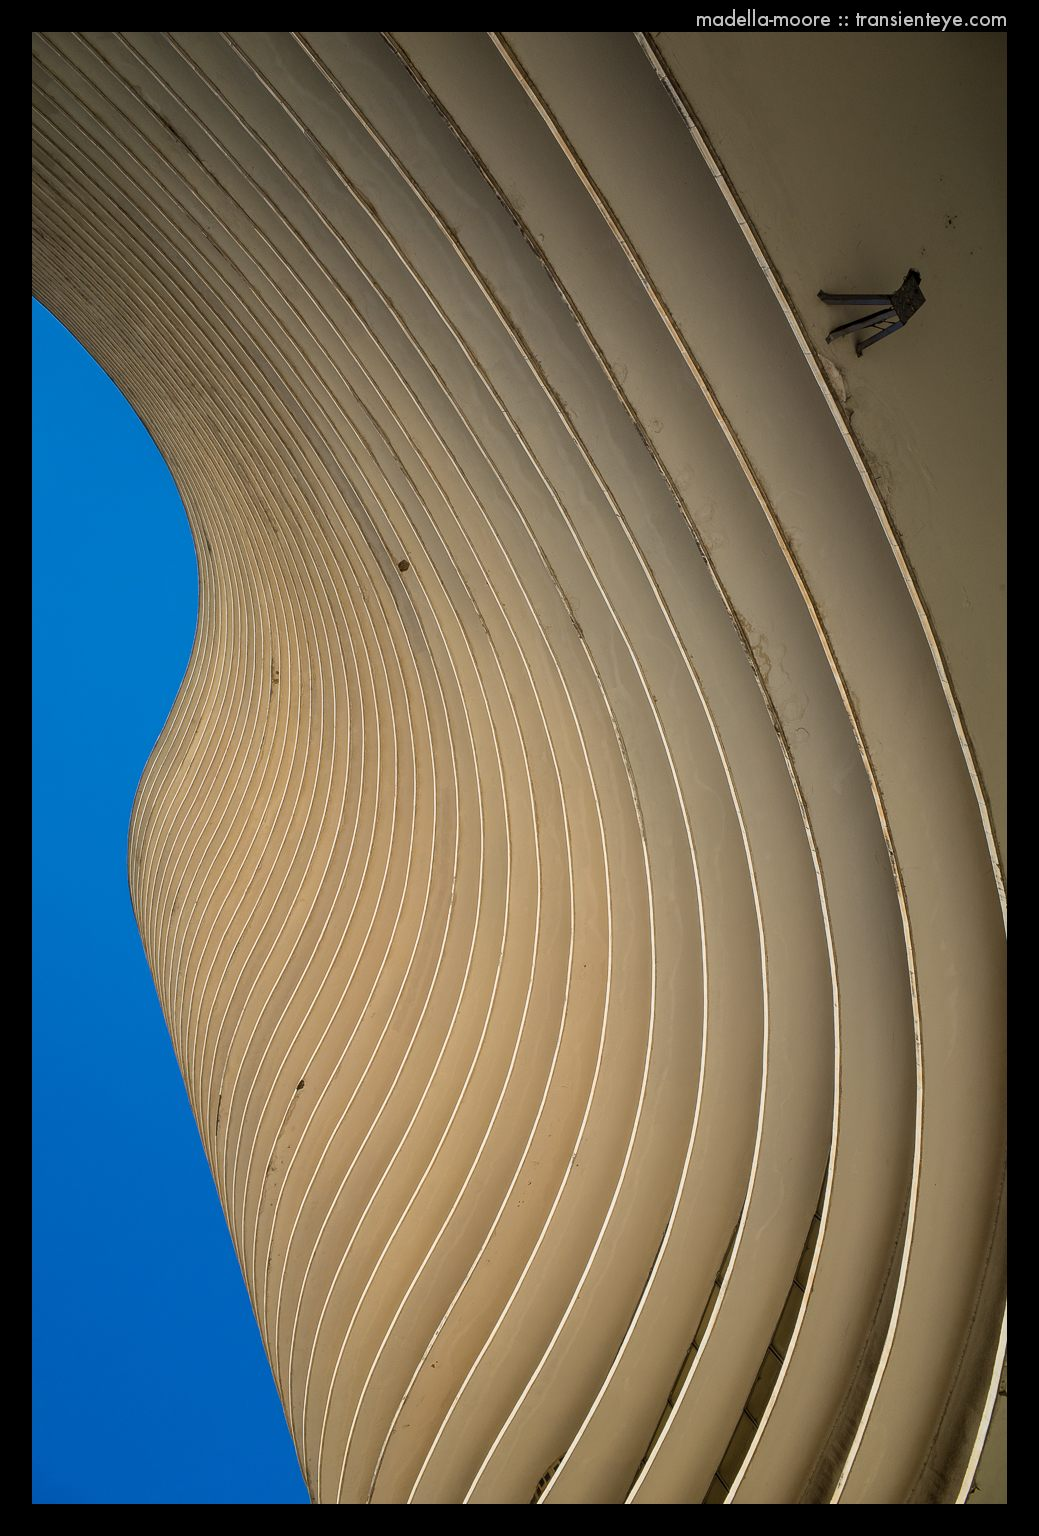 Edificio Niemeyer, Belo Horizonte, Brazil